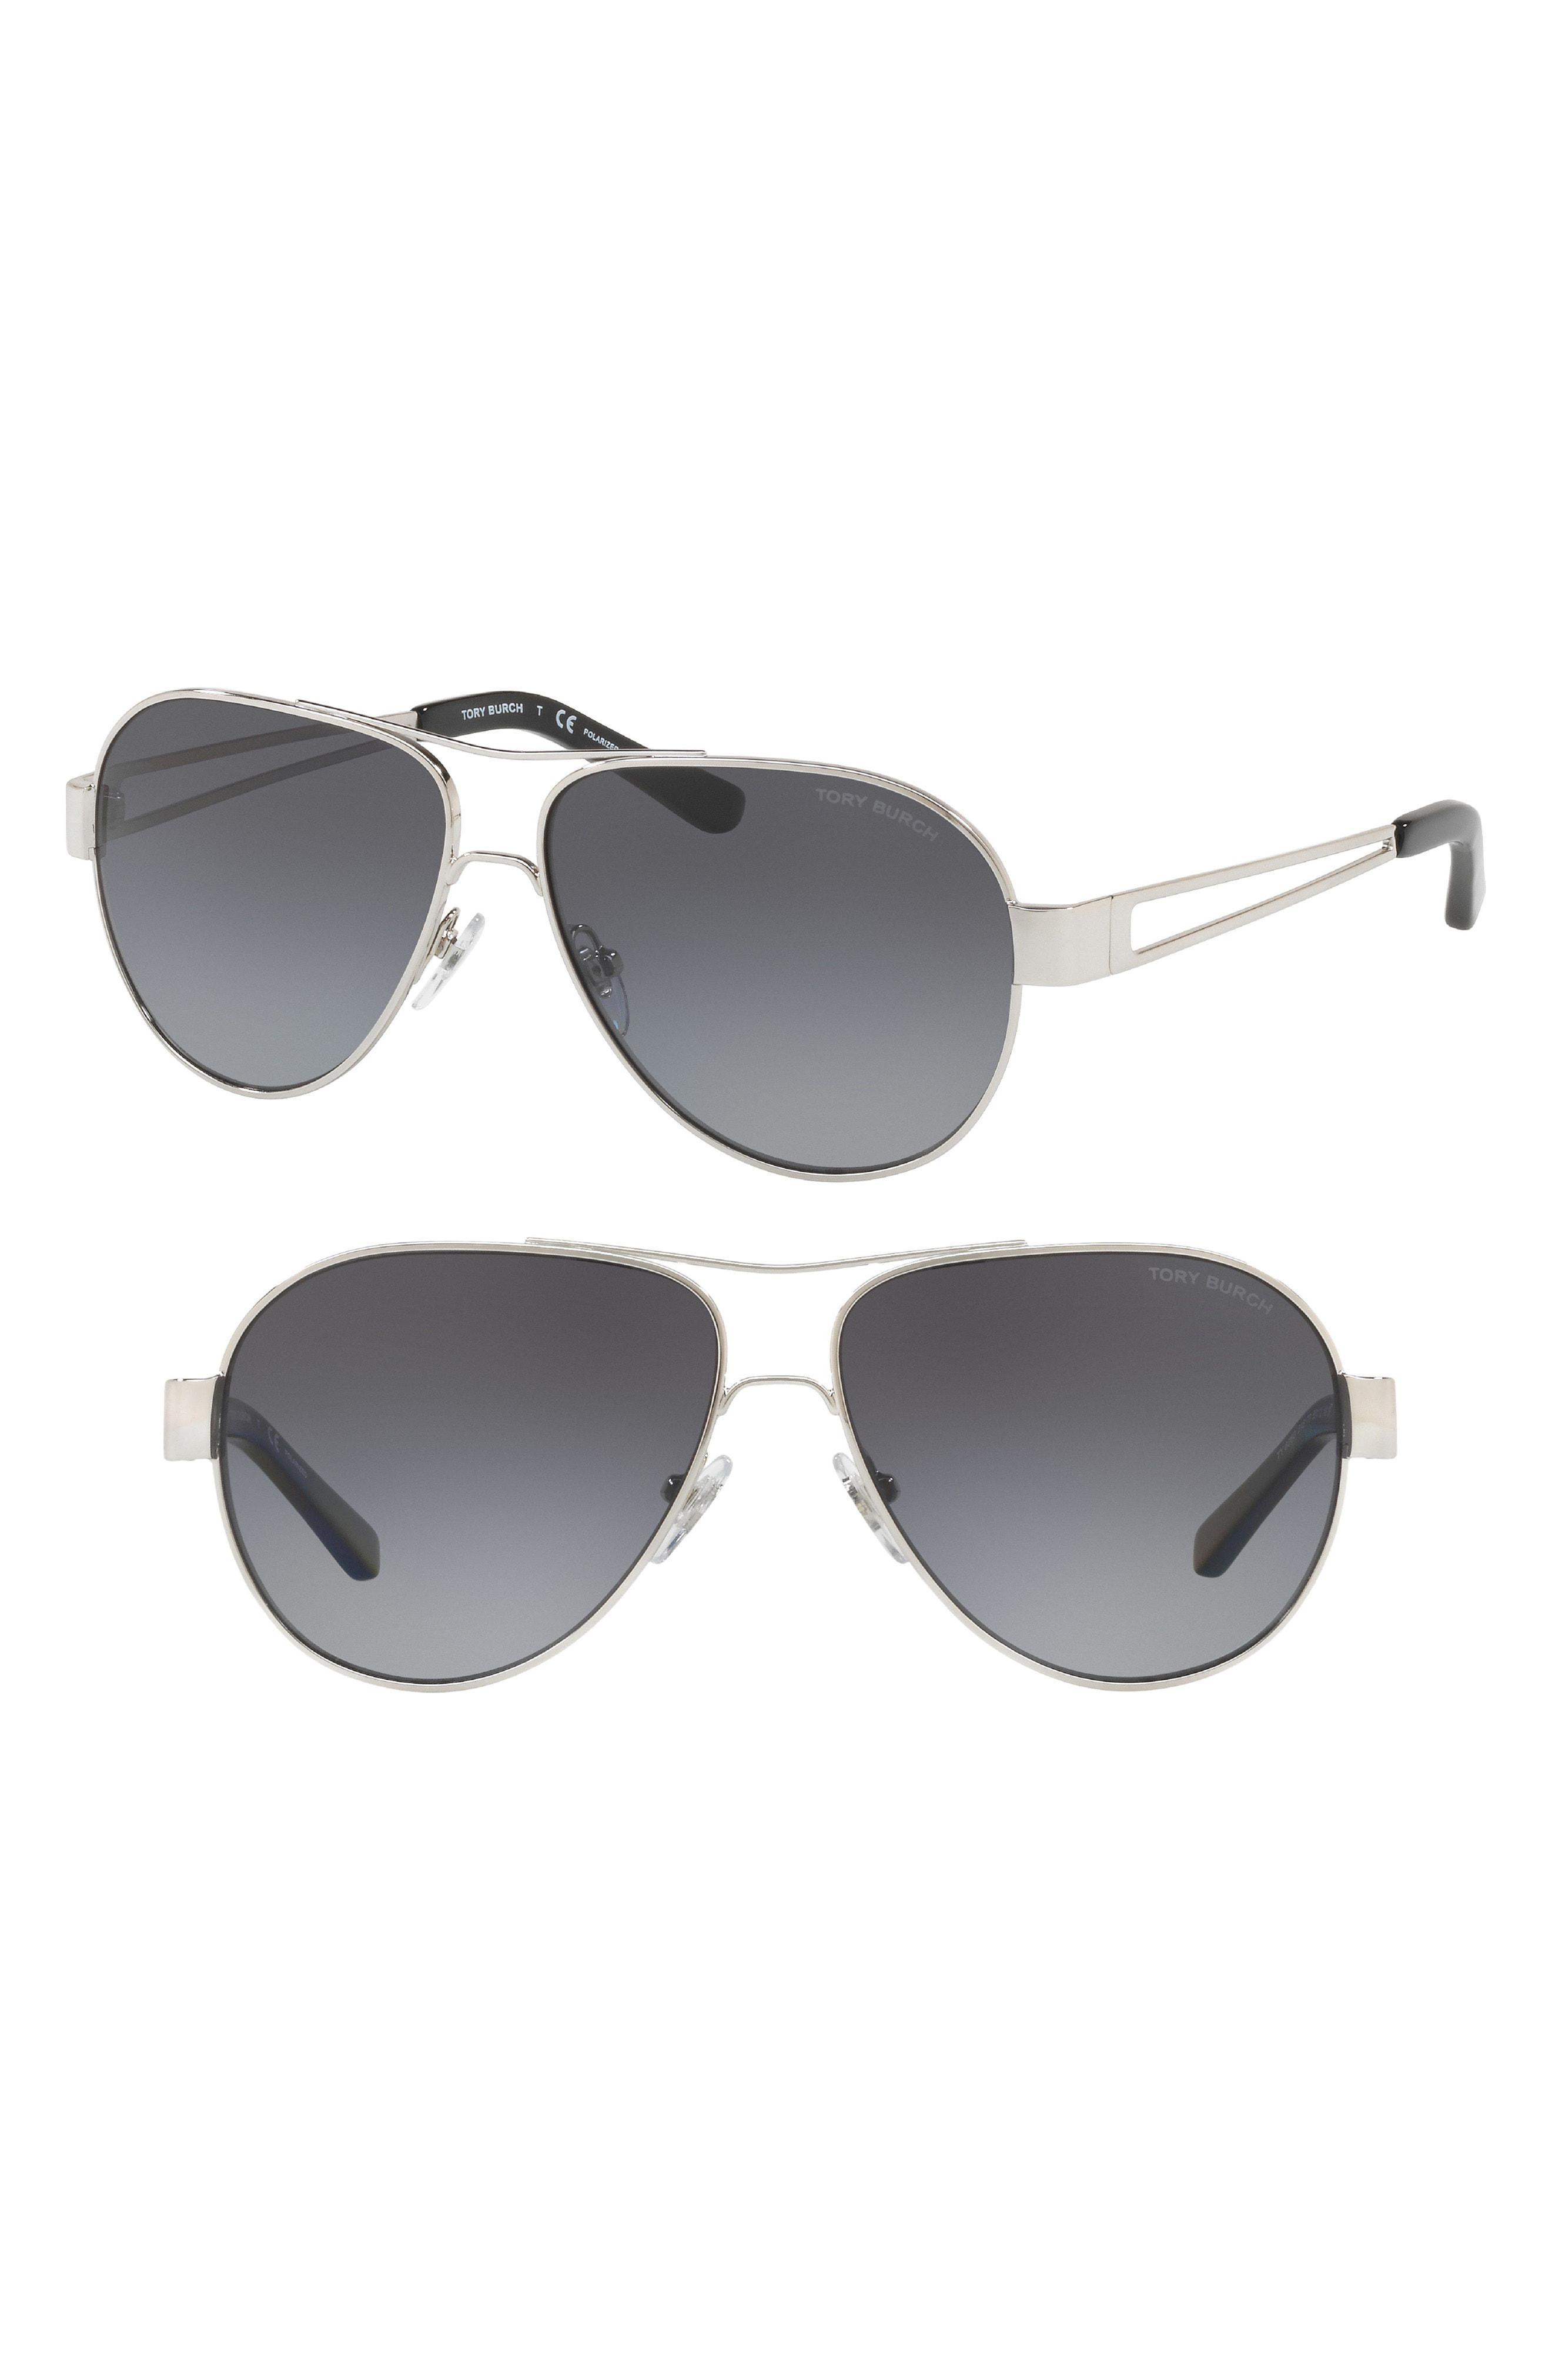 6ad02171b38 Lyst - Tory Burch 55mm Polarized Aviator Sunglasses in Metallic